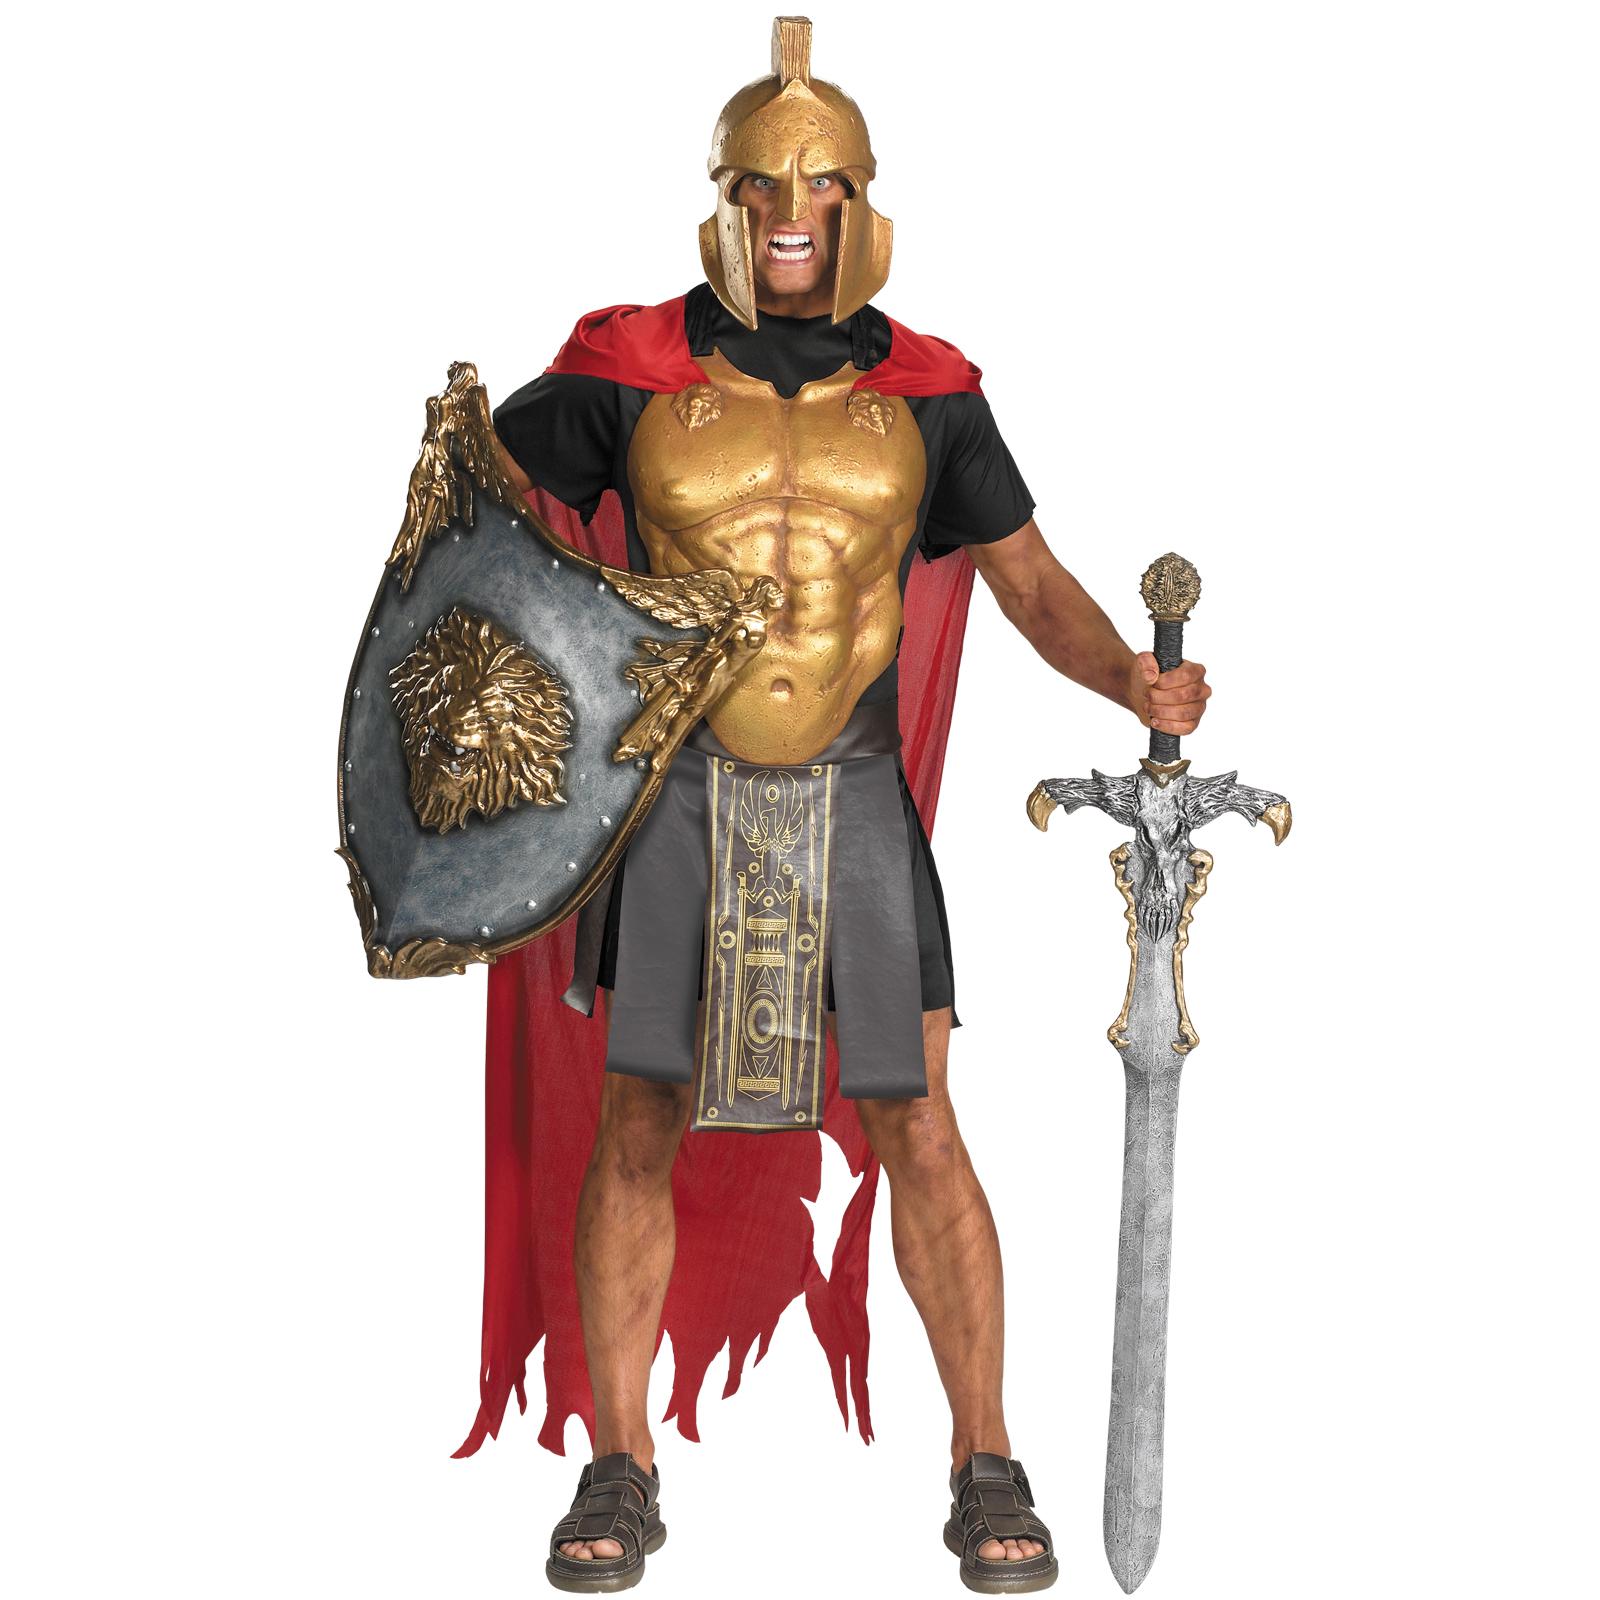 Spartan warrior armor ancient greek warriors armor related keywords